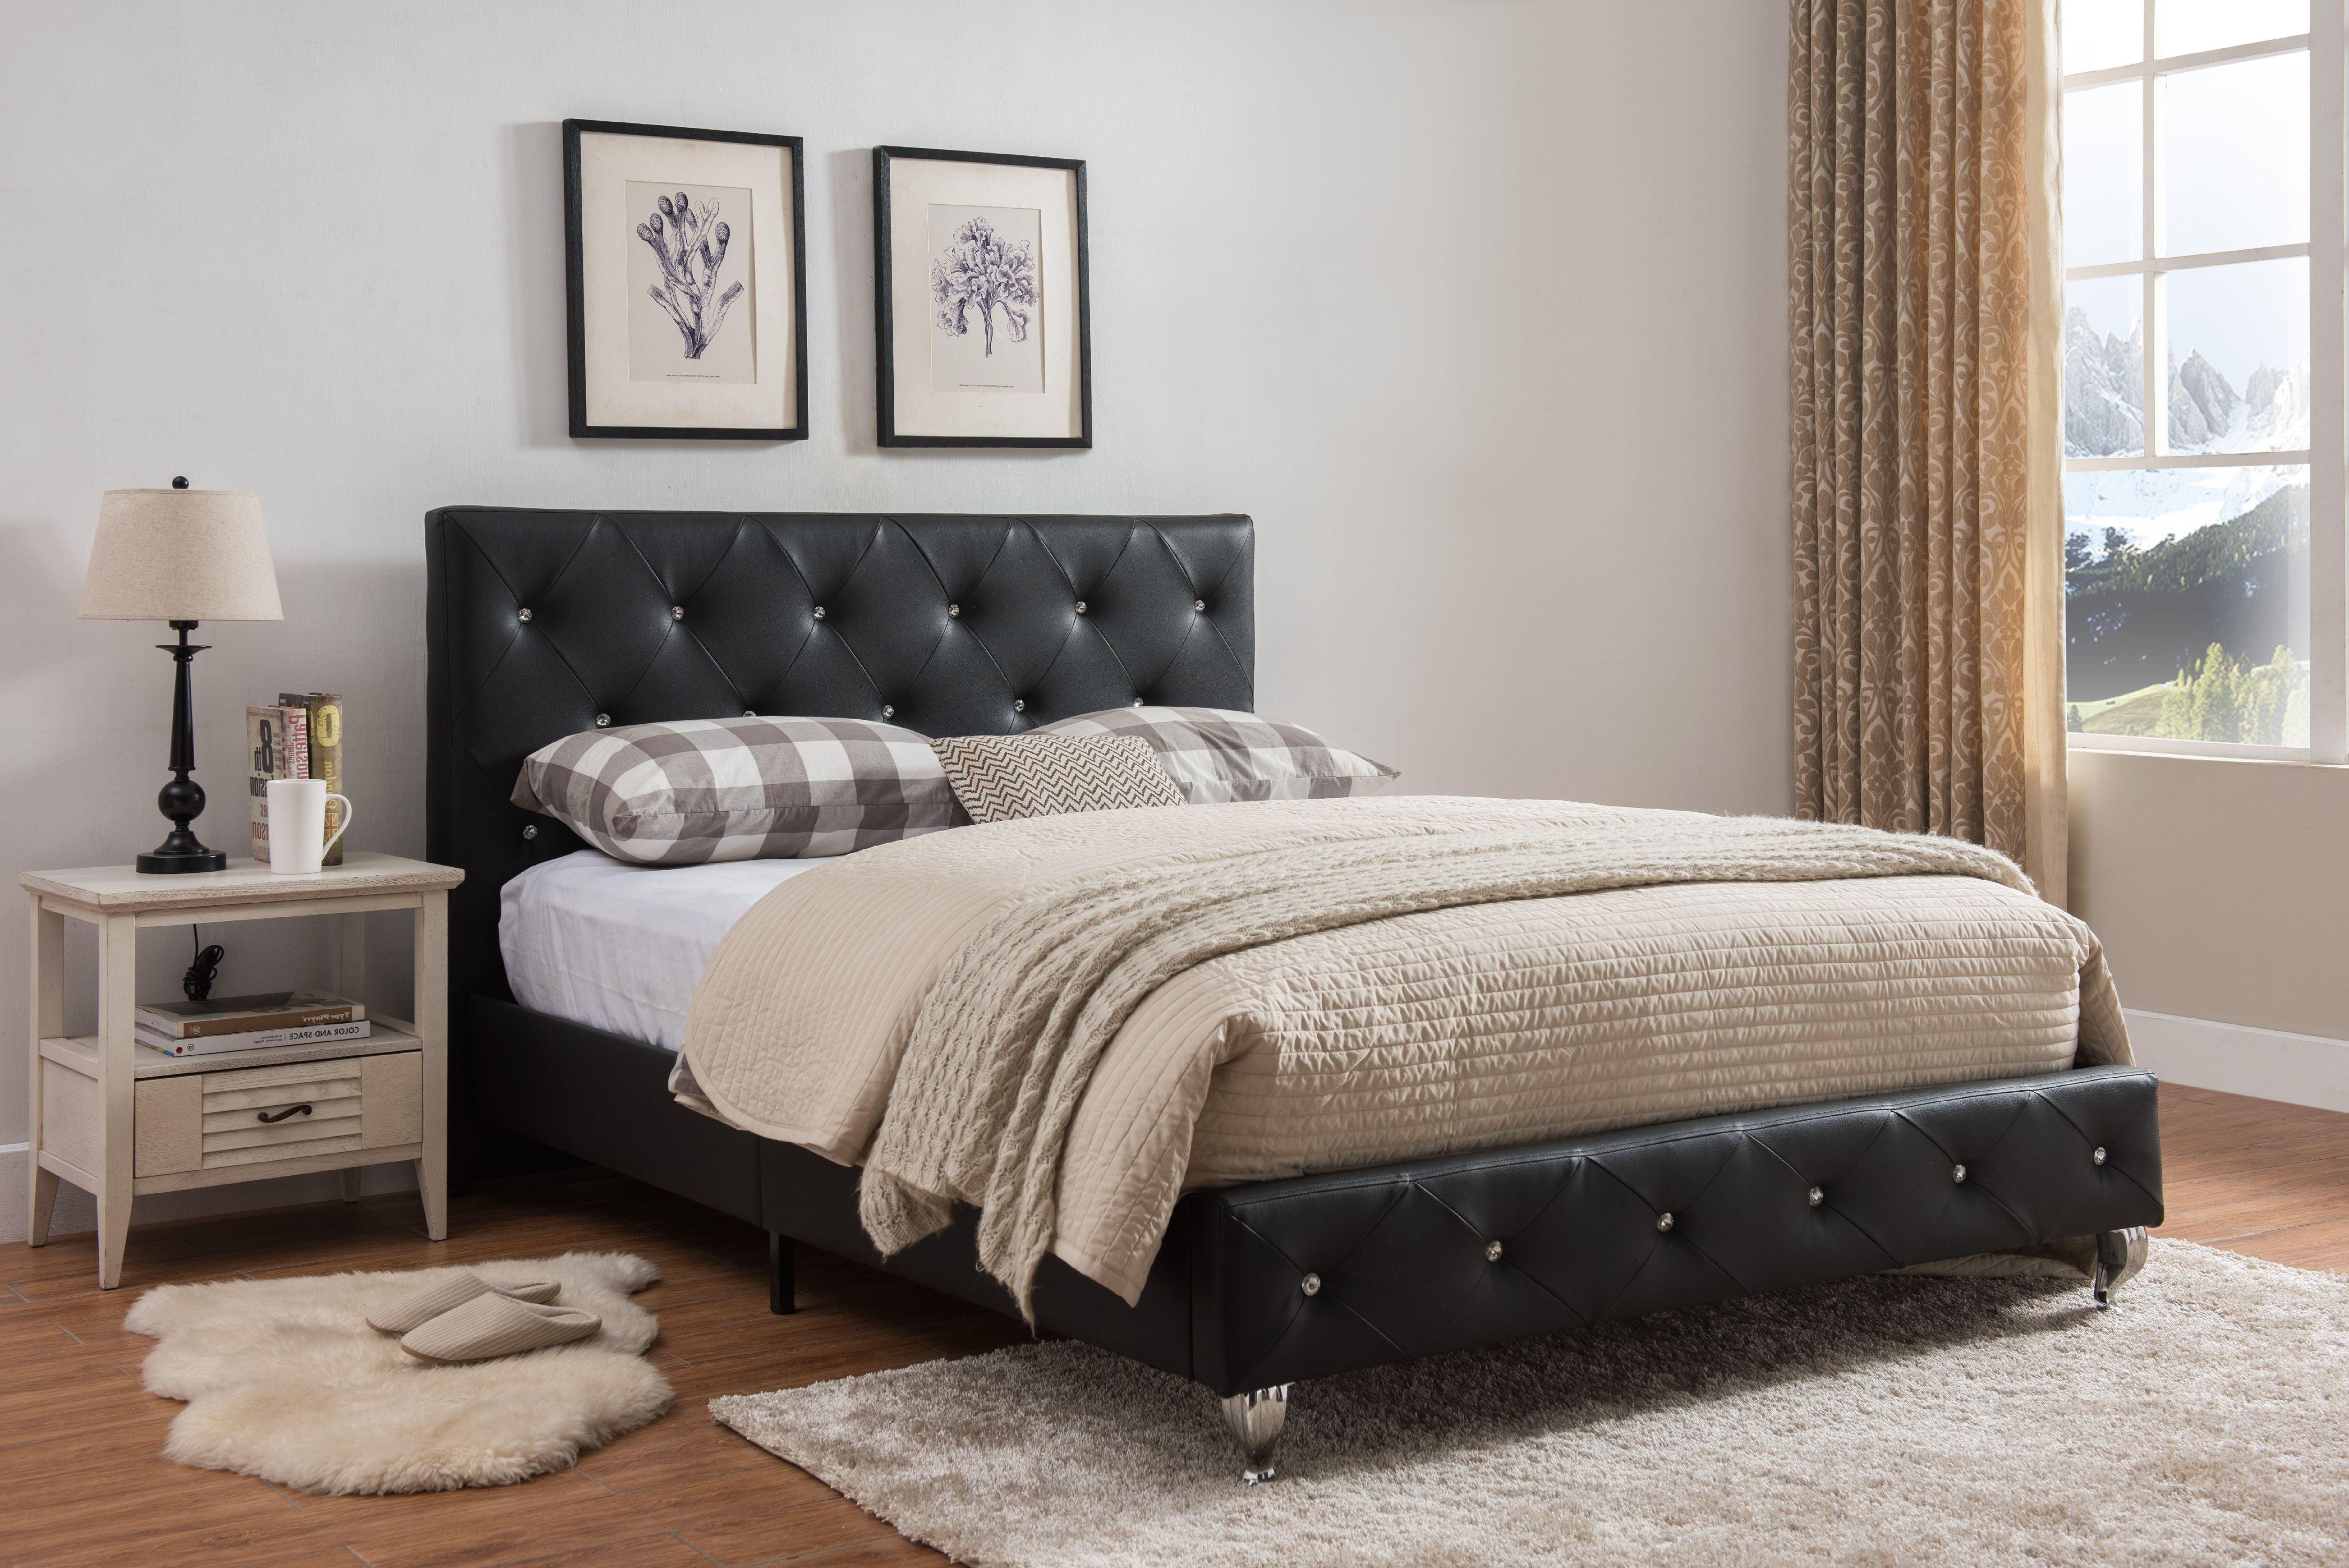 Cora King Size Black Transitional Upholstered Faux Leather Crystal Tufted Platform Slat Bed Headboard Footboard Rails Slats Walmart Com Walmart Com